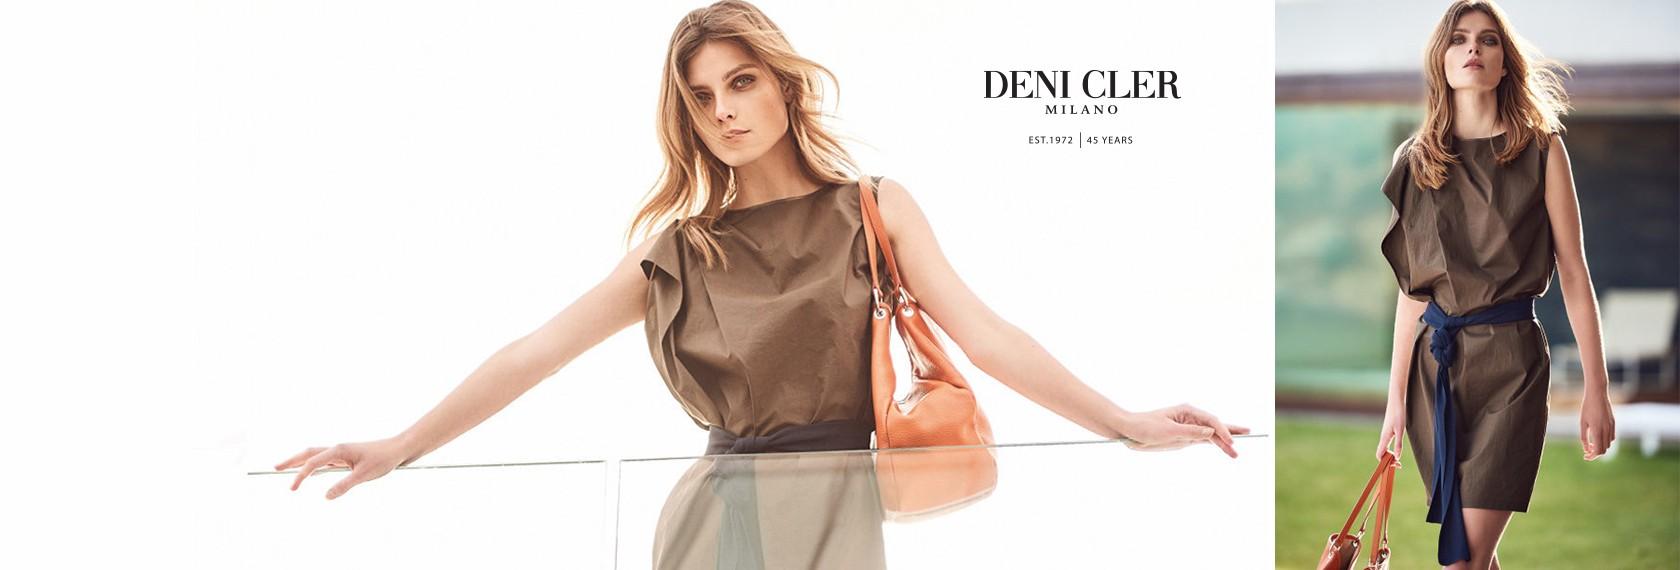 Deni Cler Milano - Case Study